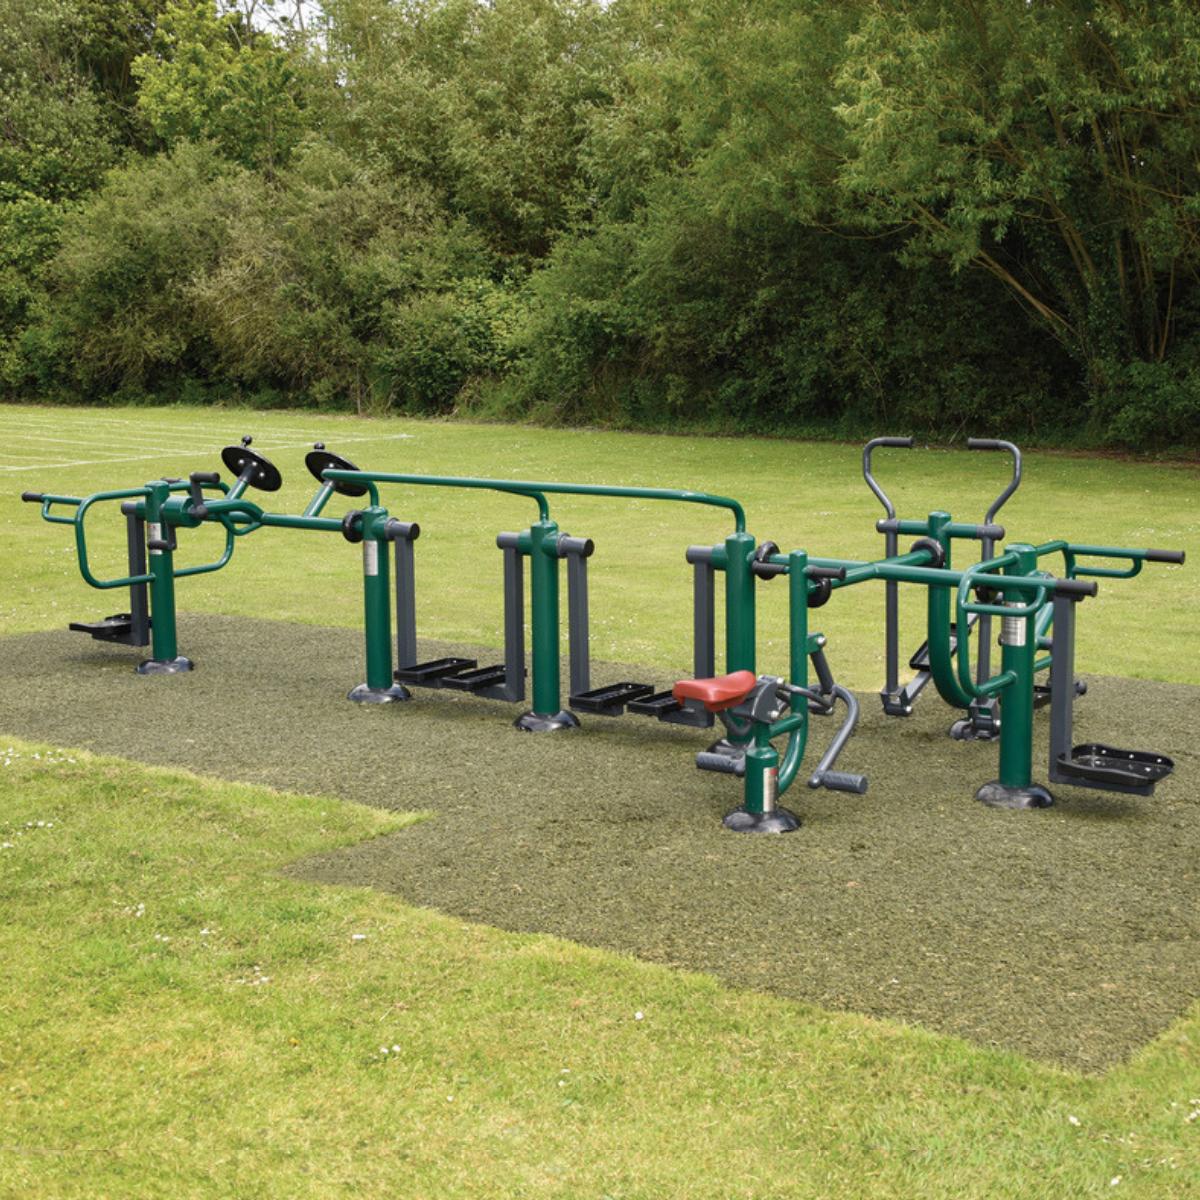 Integr8 Multi Gym   Sunshine Gym   Outdoor Gym Equipment